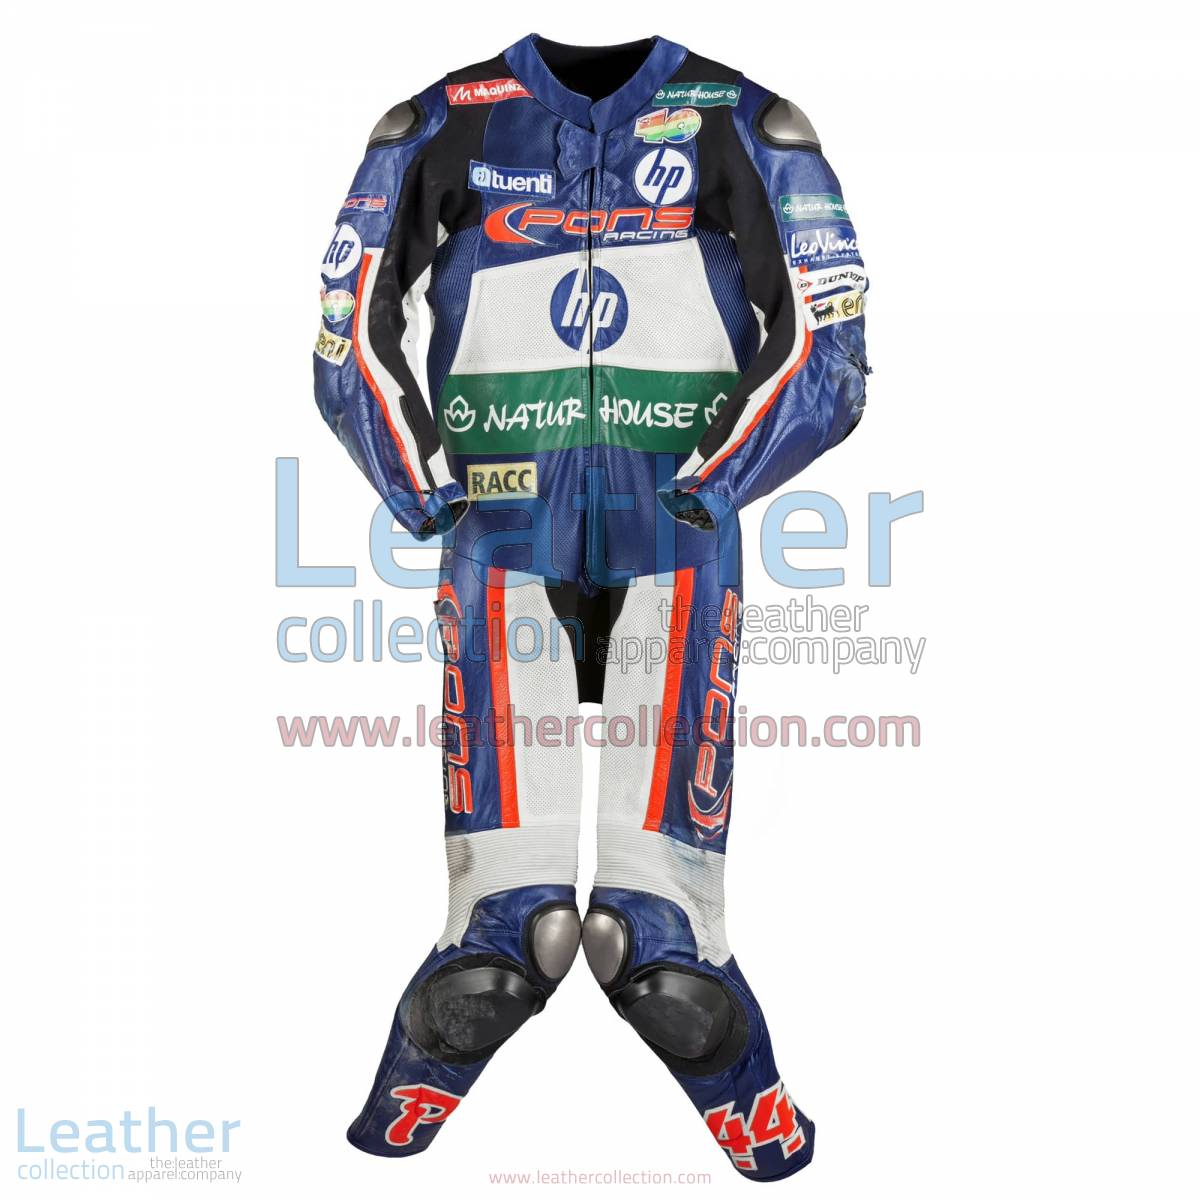 Pol Espargaro Kalex 2012 Motorcycle Racing Suit | motorcycle racing suit